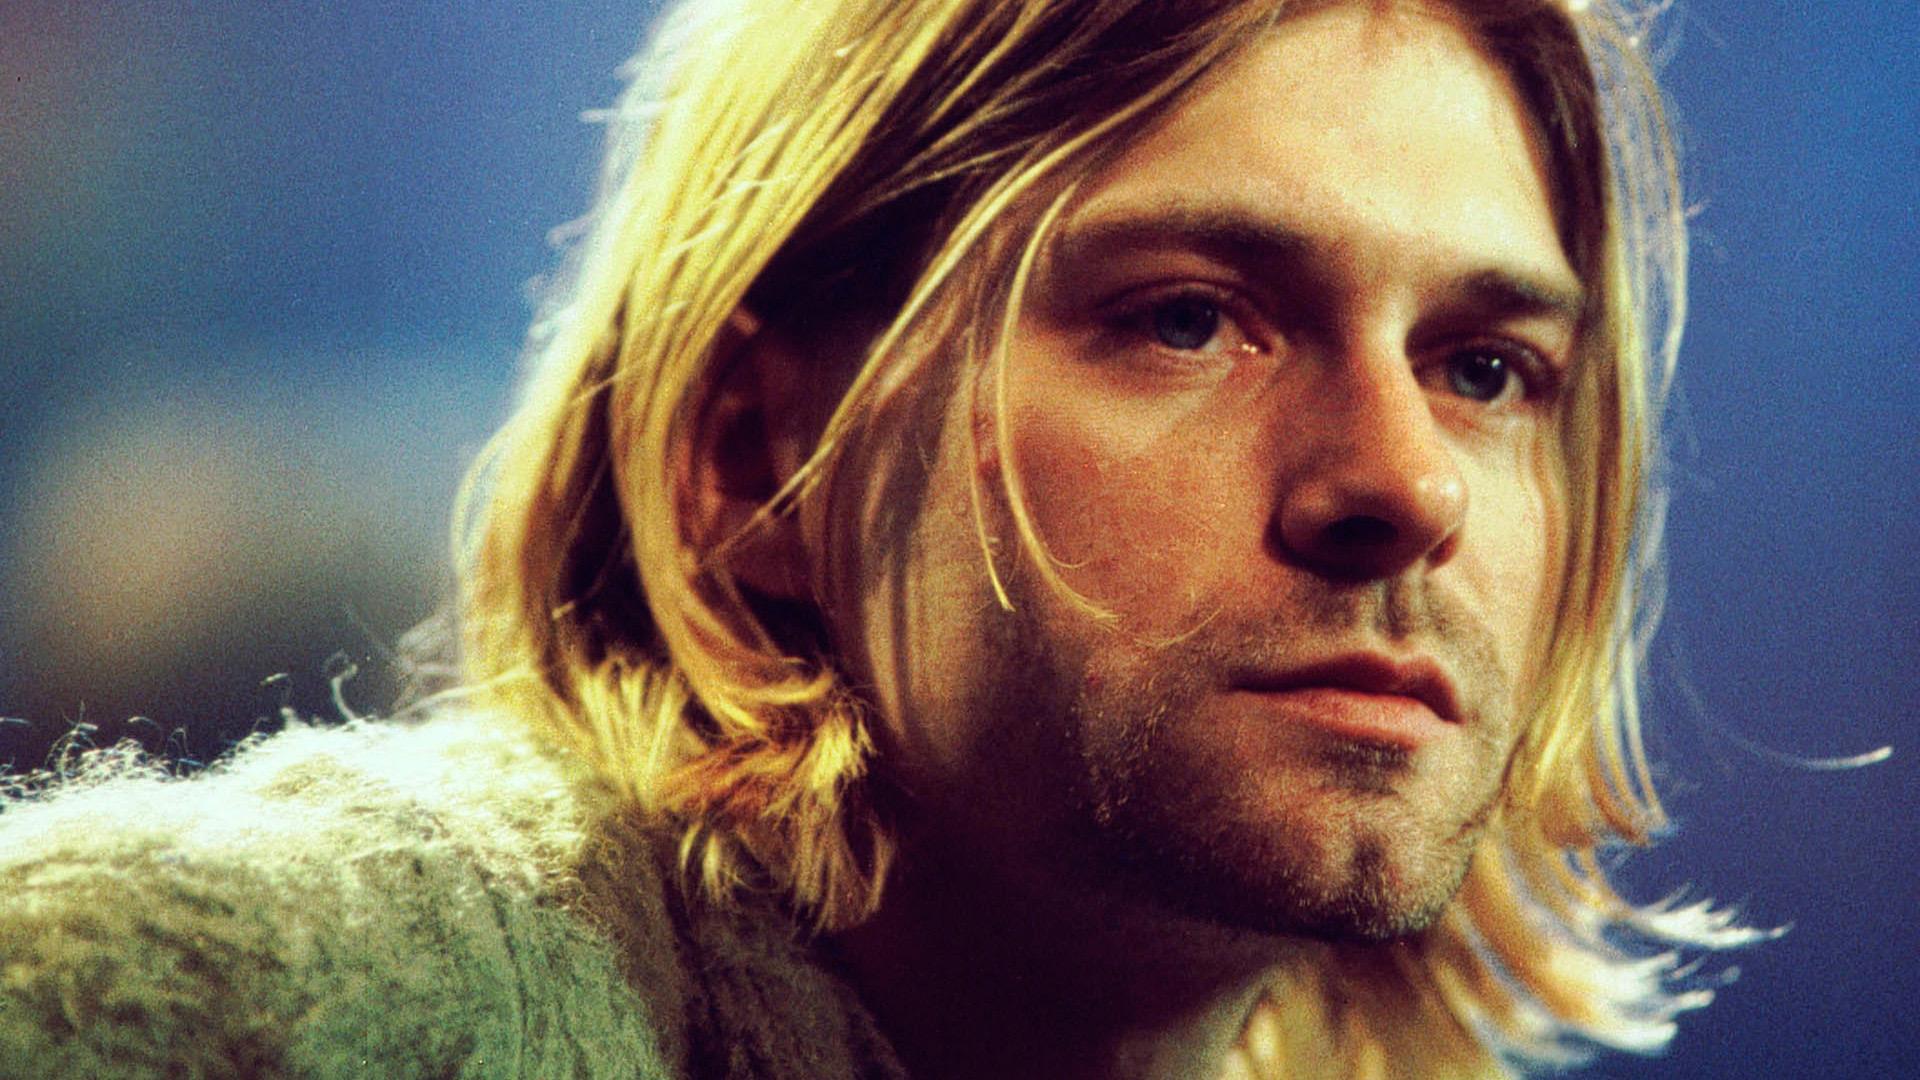 HD Wallpapers Kurt Cobain Galleries Kurt Cobain Pics Kurt Cobain 1920x1080